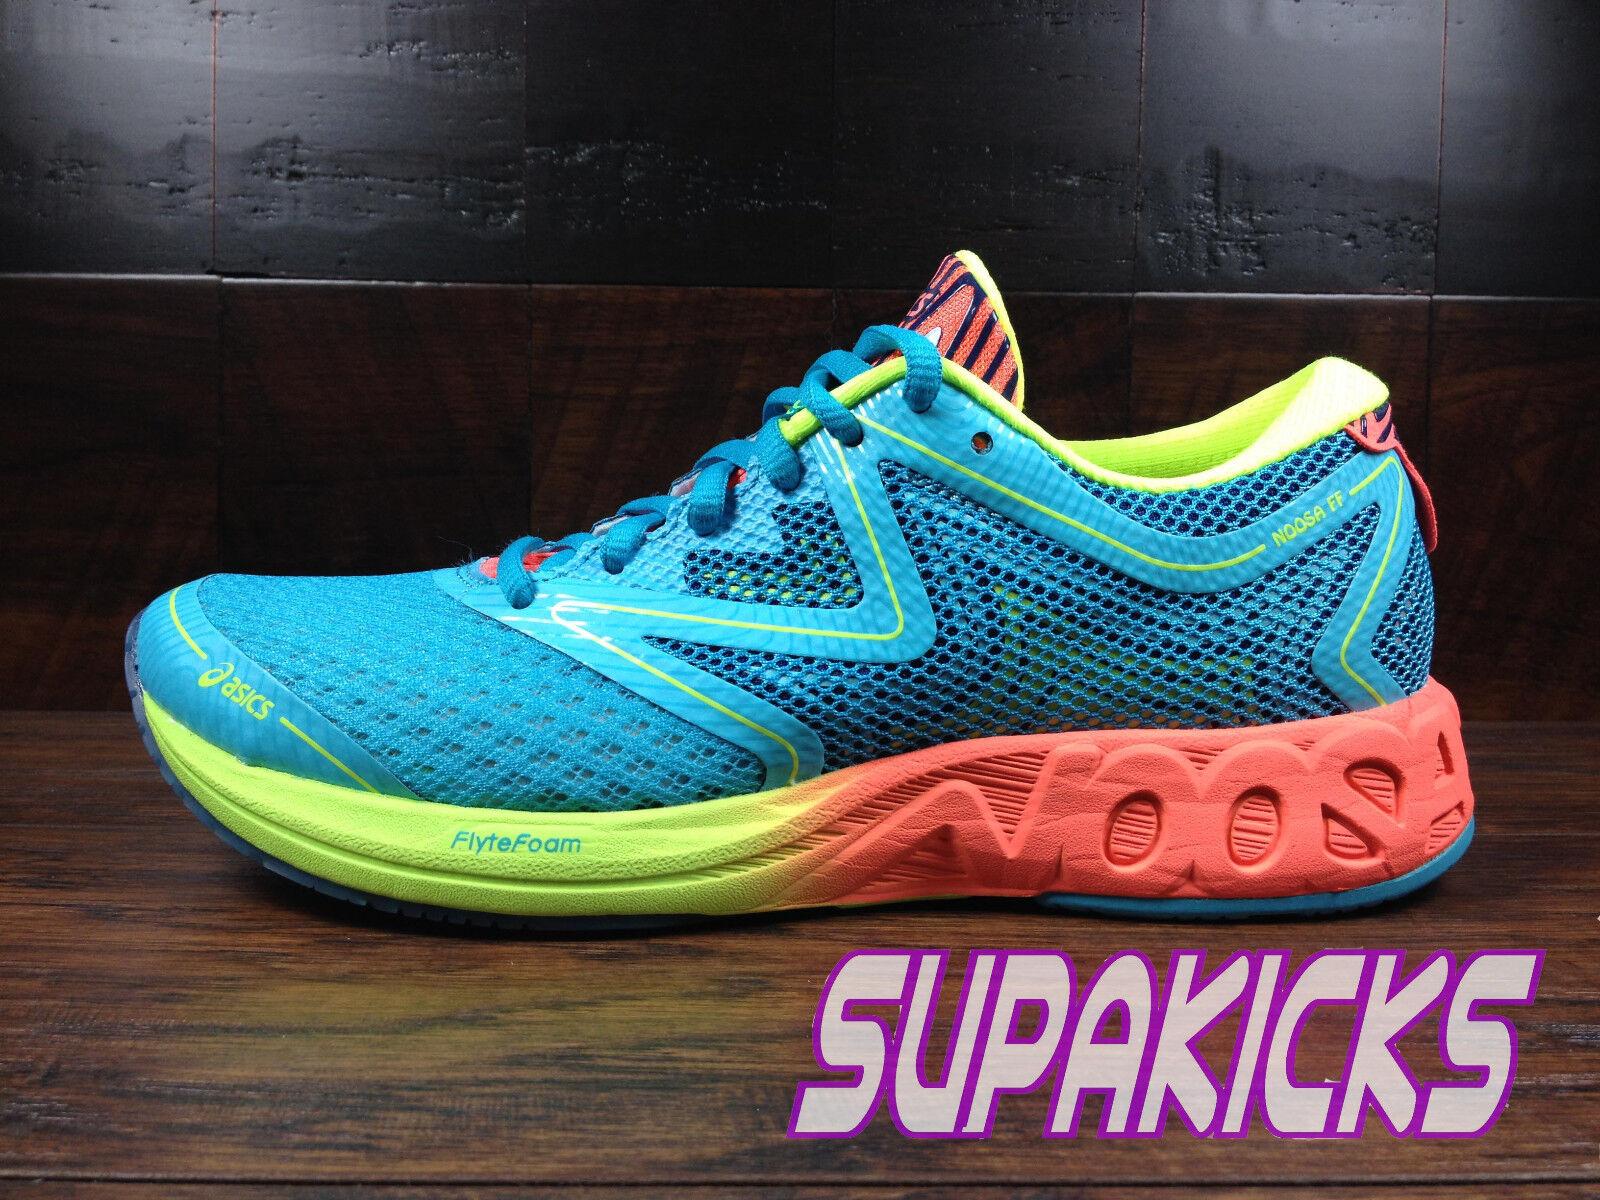 Asics Noosa FF (T772N-3906) (Aqua Coral Yellow) Triathlon Running Womens 6-11